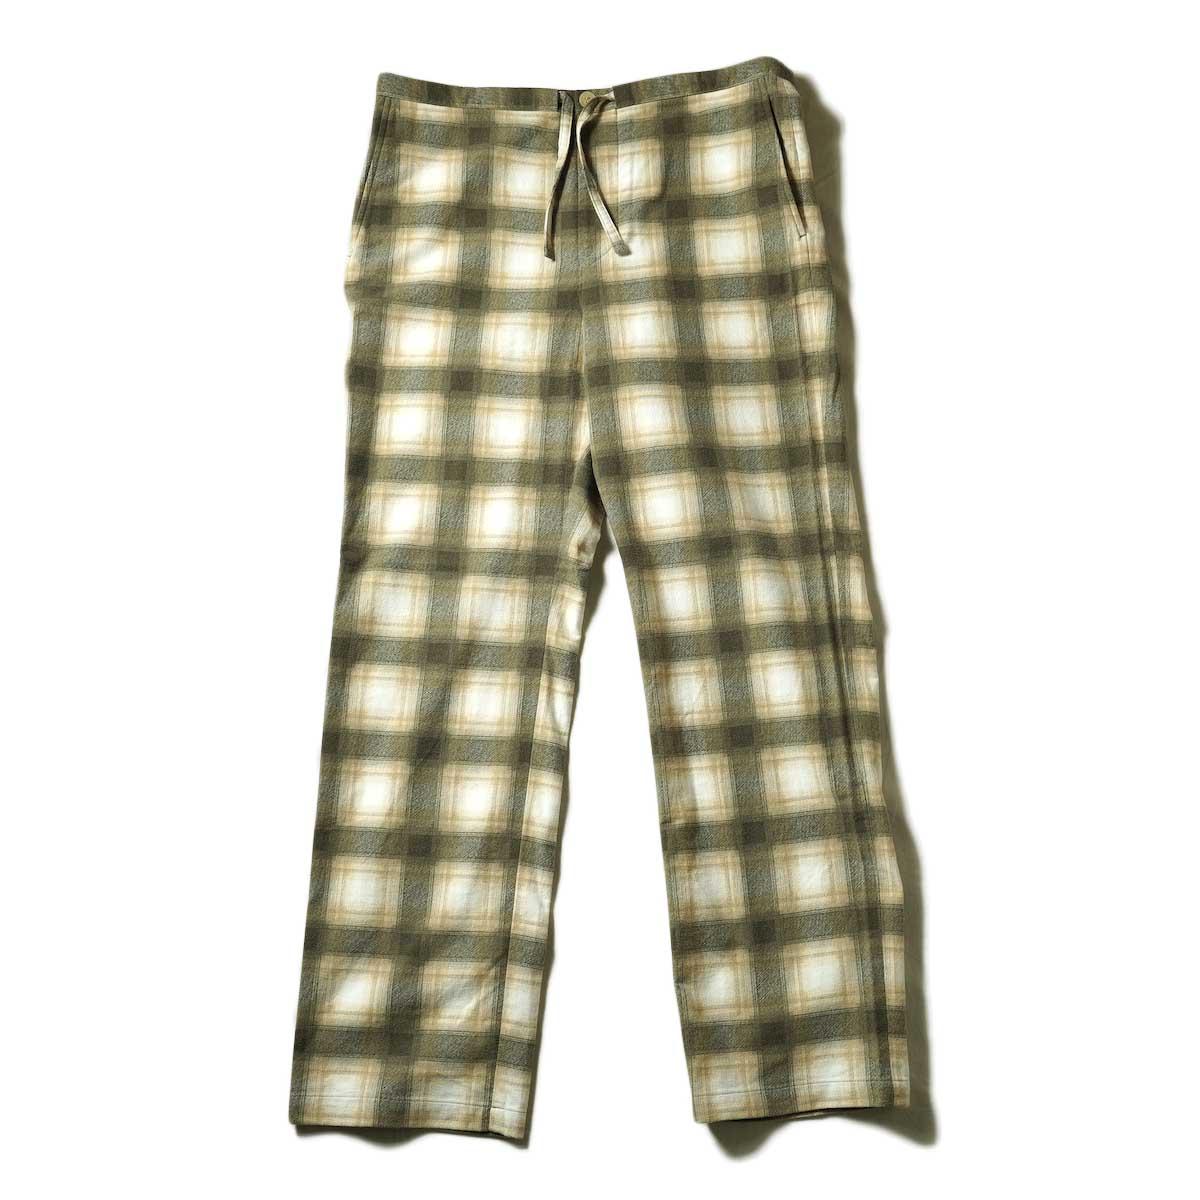 UNUSED / UW0993 Check Pants (Beige)